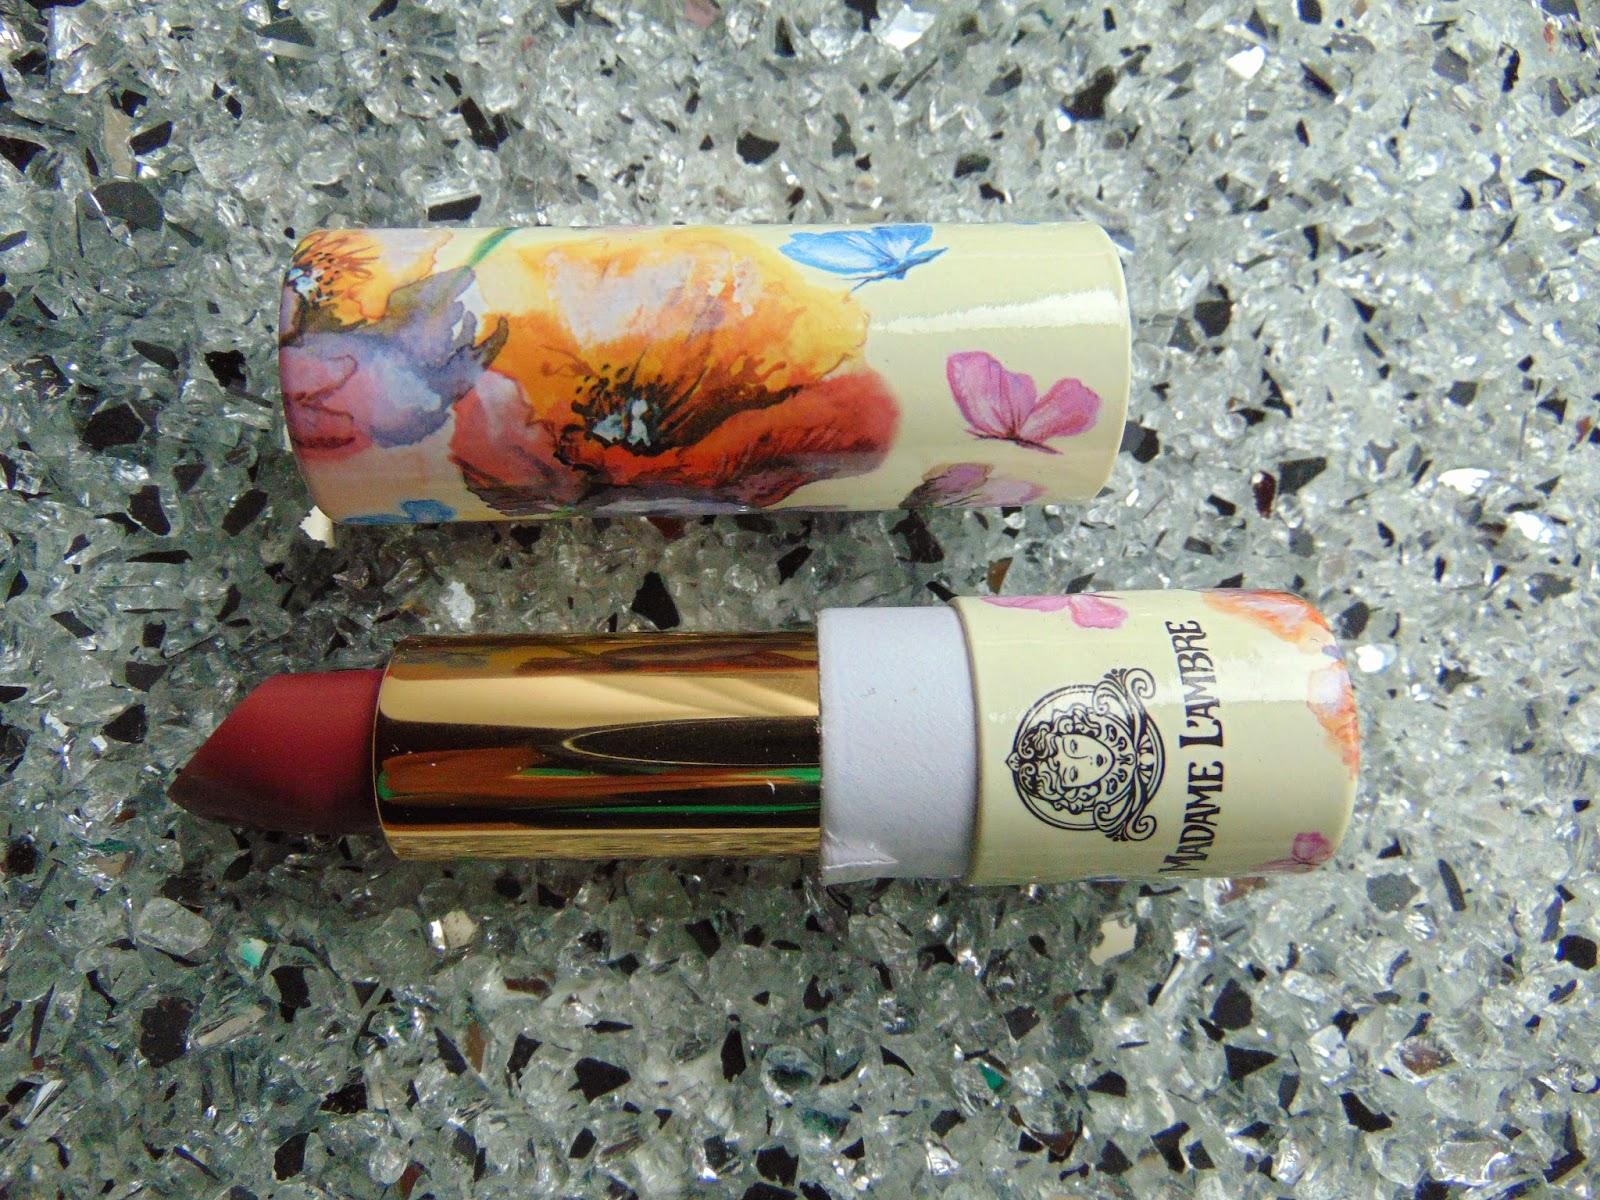 L'ambre Lipstick Madame Lambre - www.annitschkasblog.de